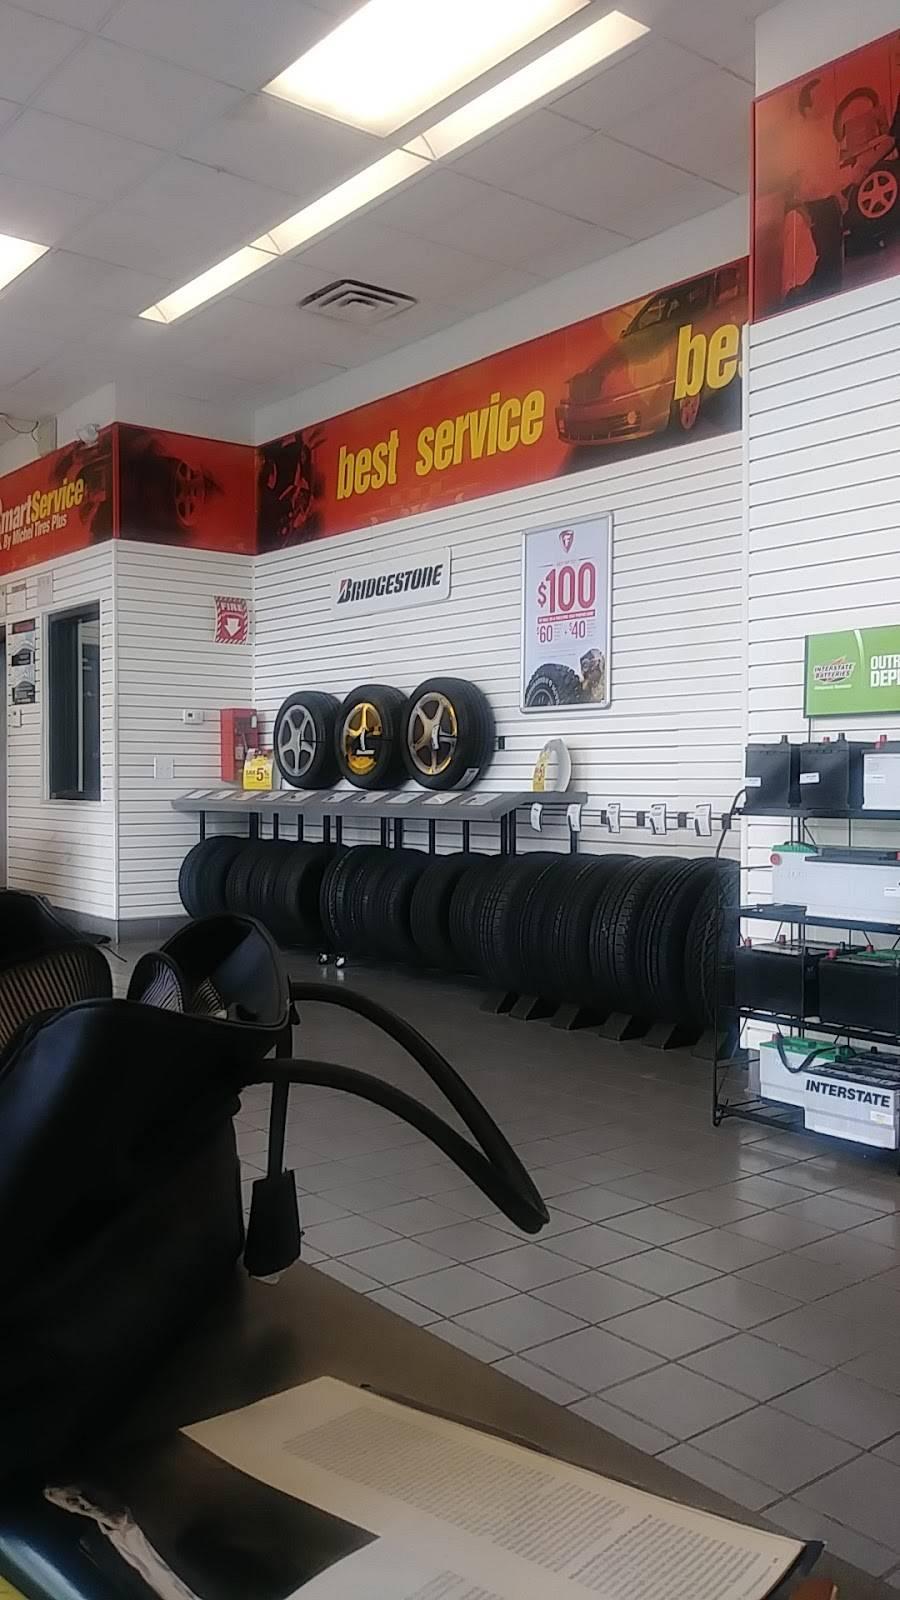 Michel Tires Plus - car repair  | Photo 10 of 10 | Address: 272 W Mitchell Ave, Cincinnati, OH 45232, USA | Phone: (513) 401-7188